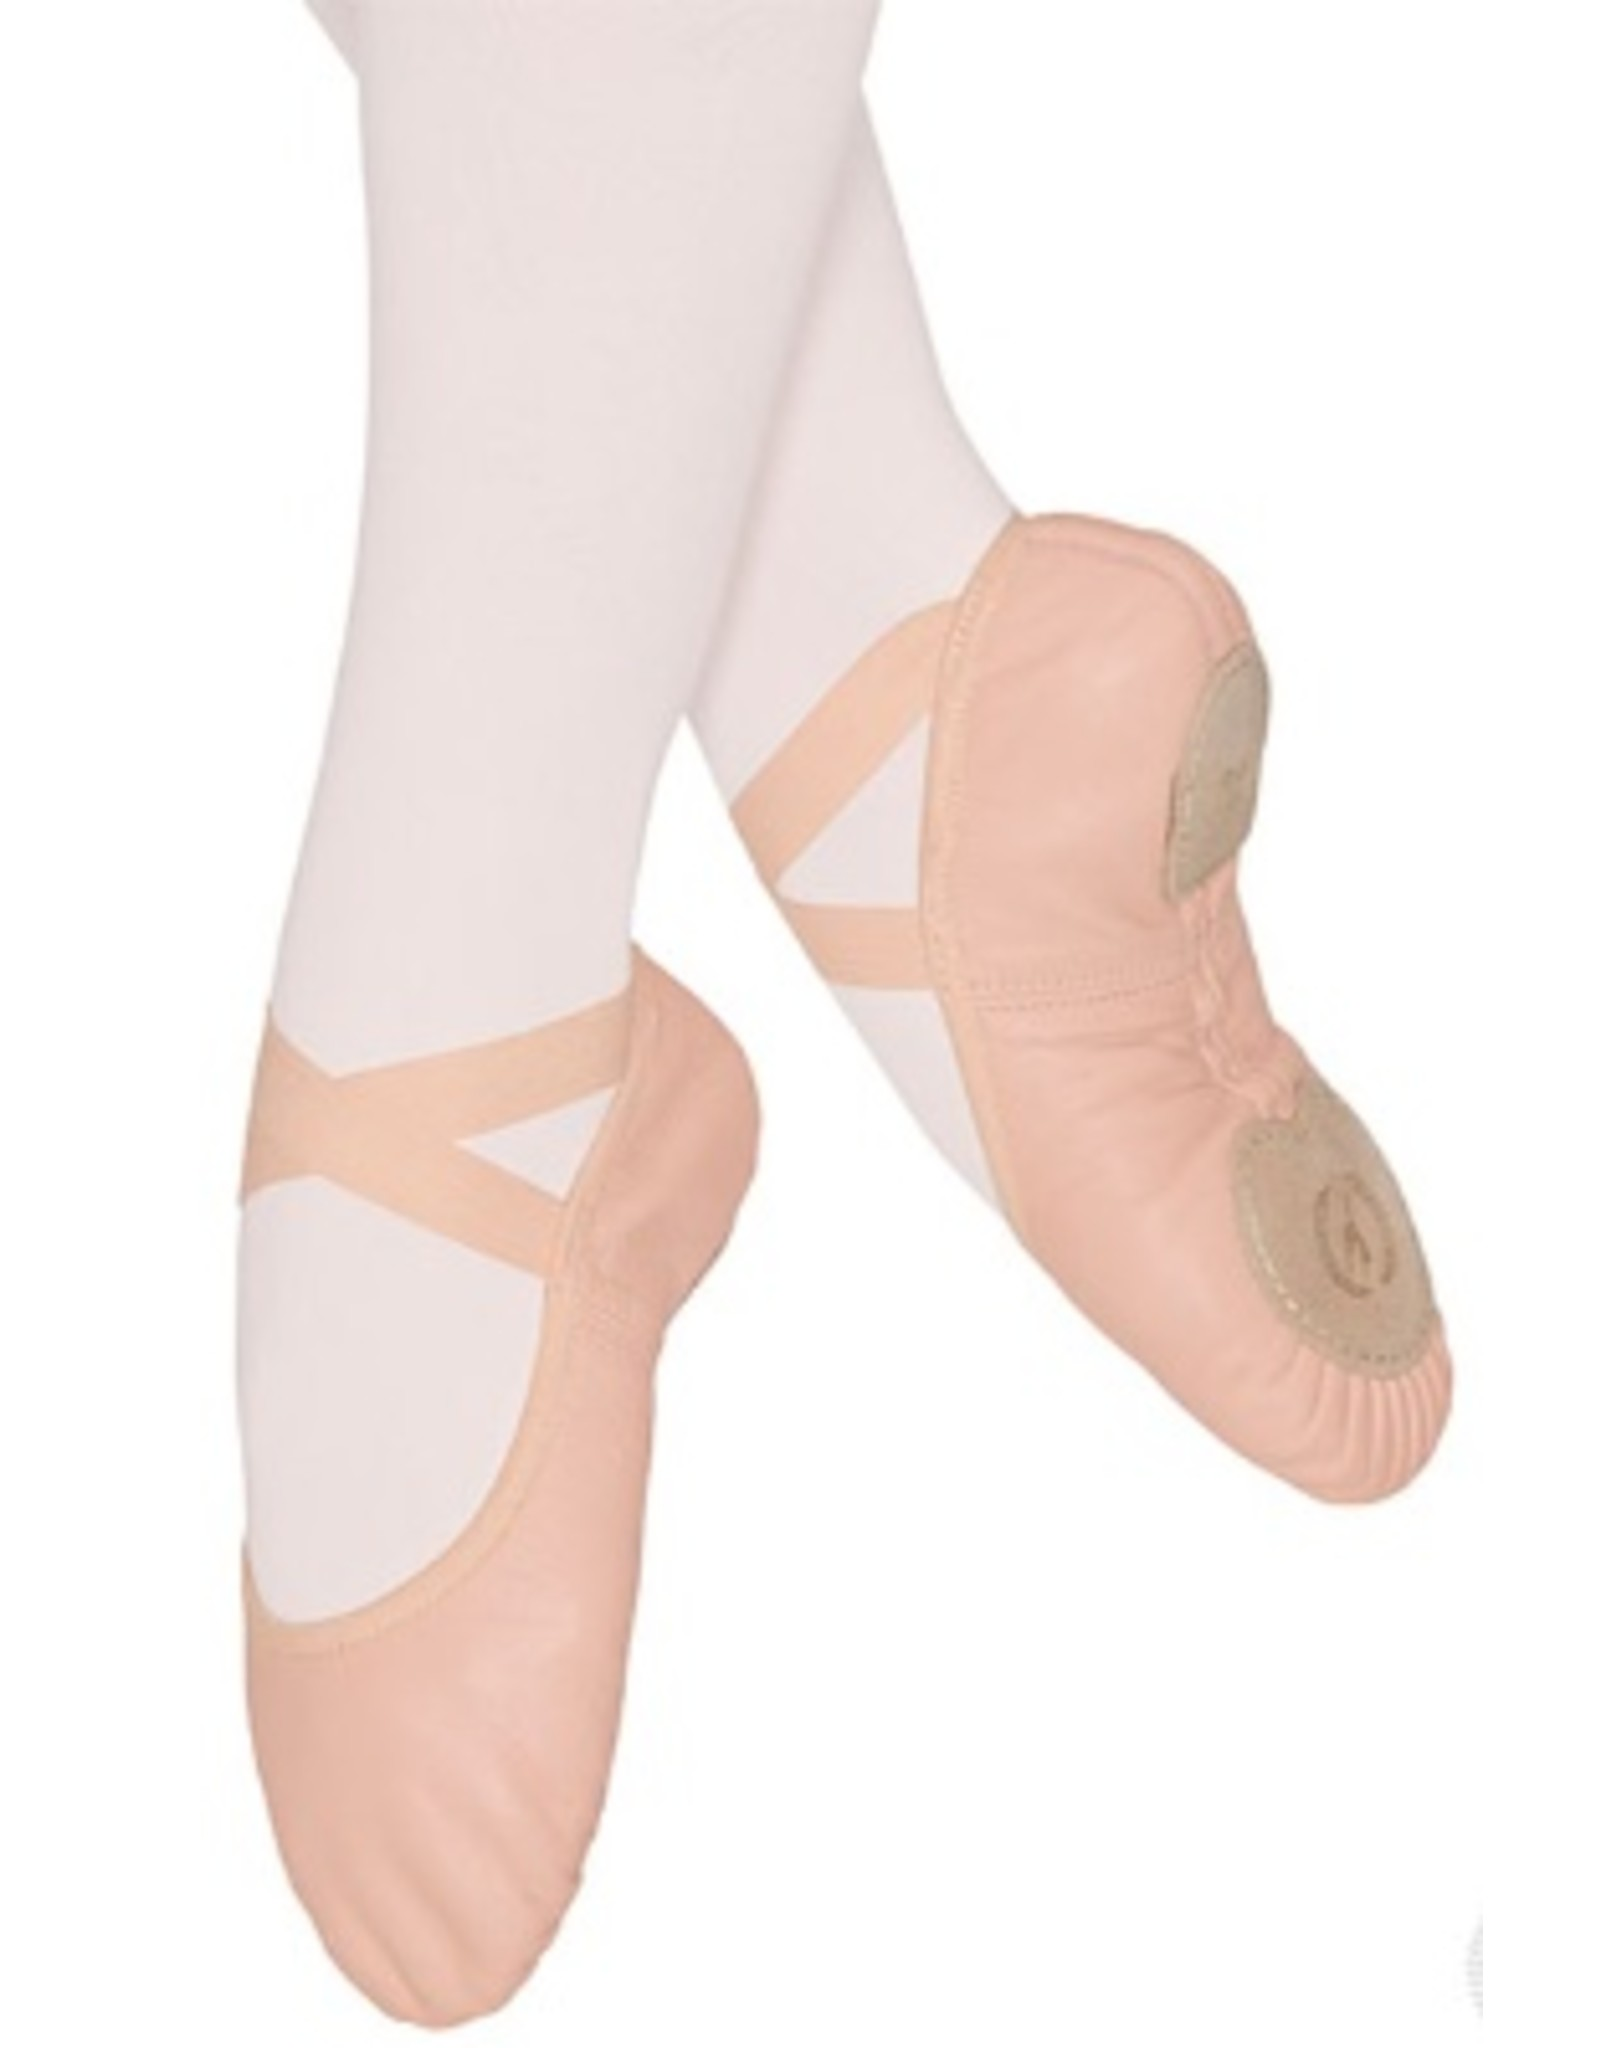 Eurotard Coupe Split Sole Leather Ballet Slipper - Child